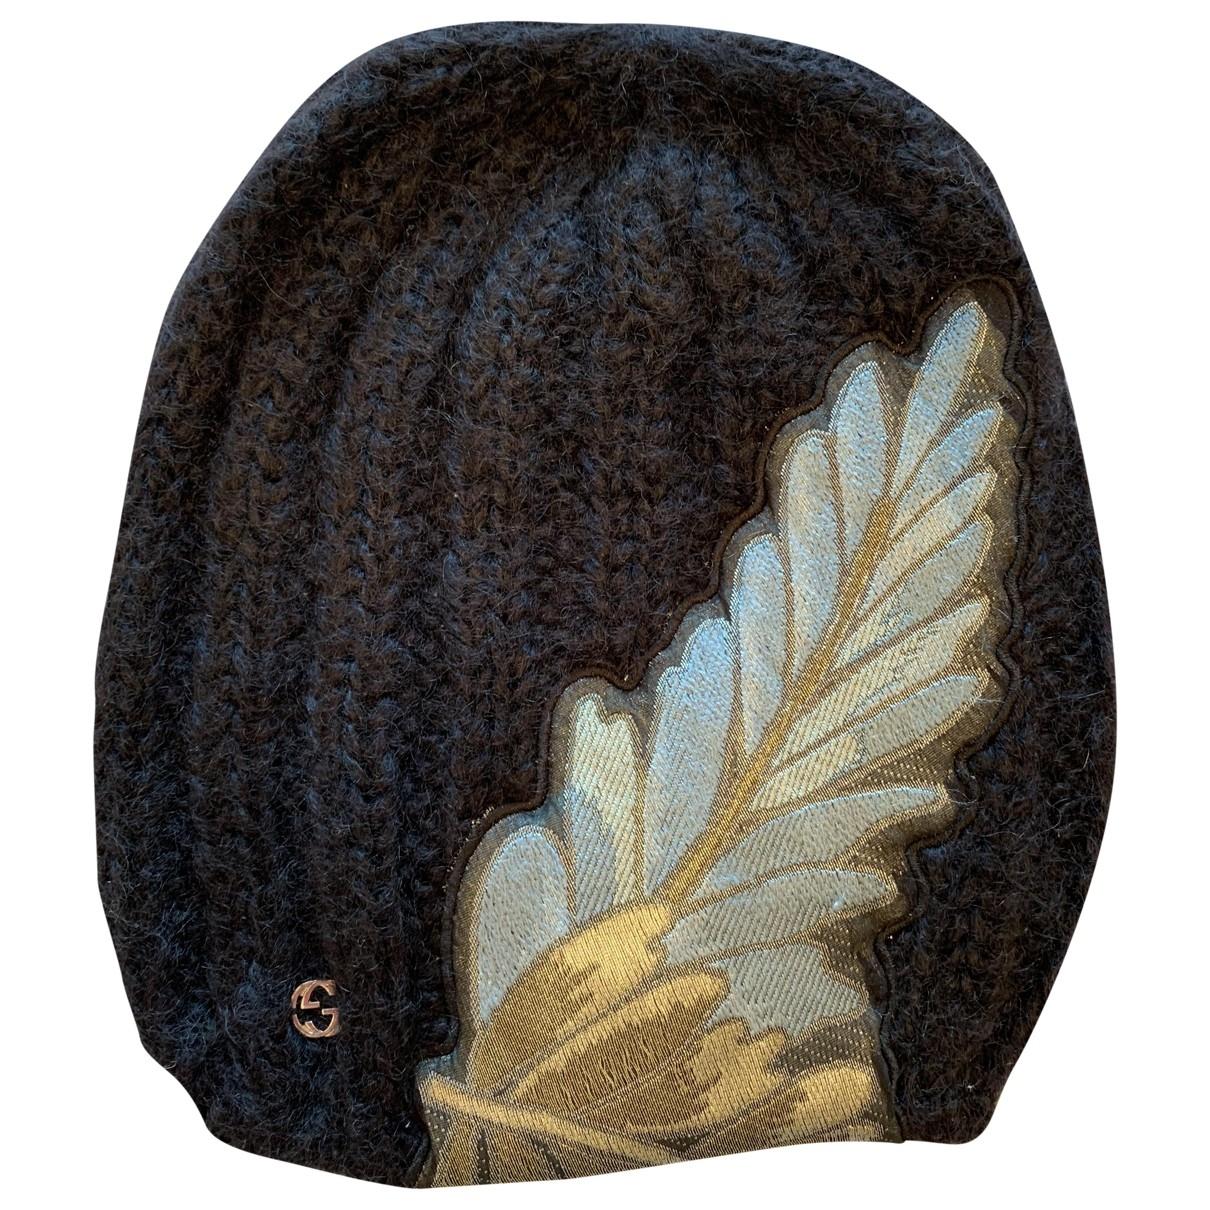 Gucci \N Brown Wool hat for Women S International